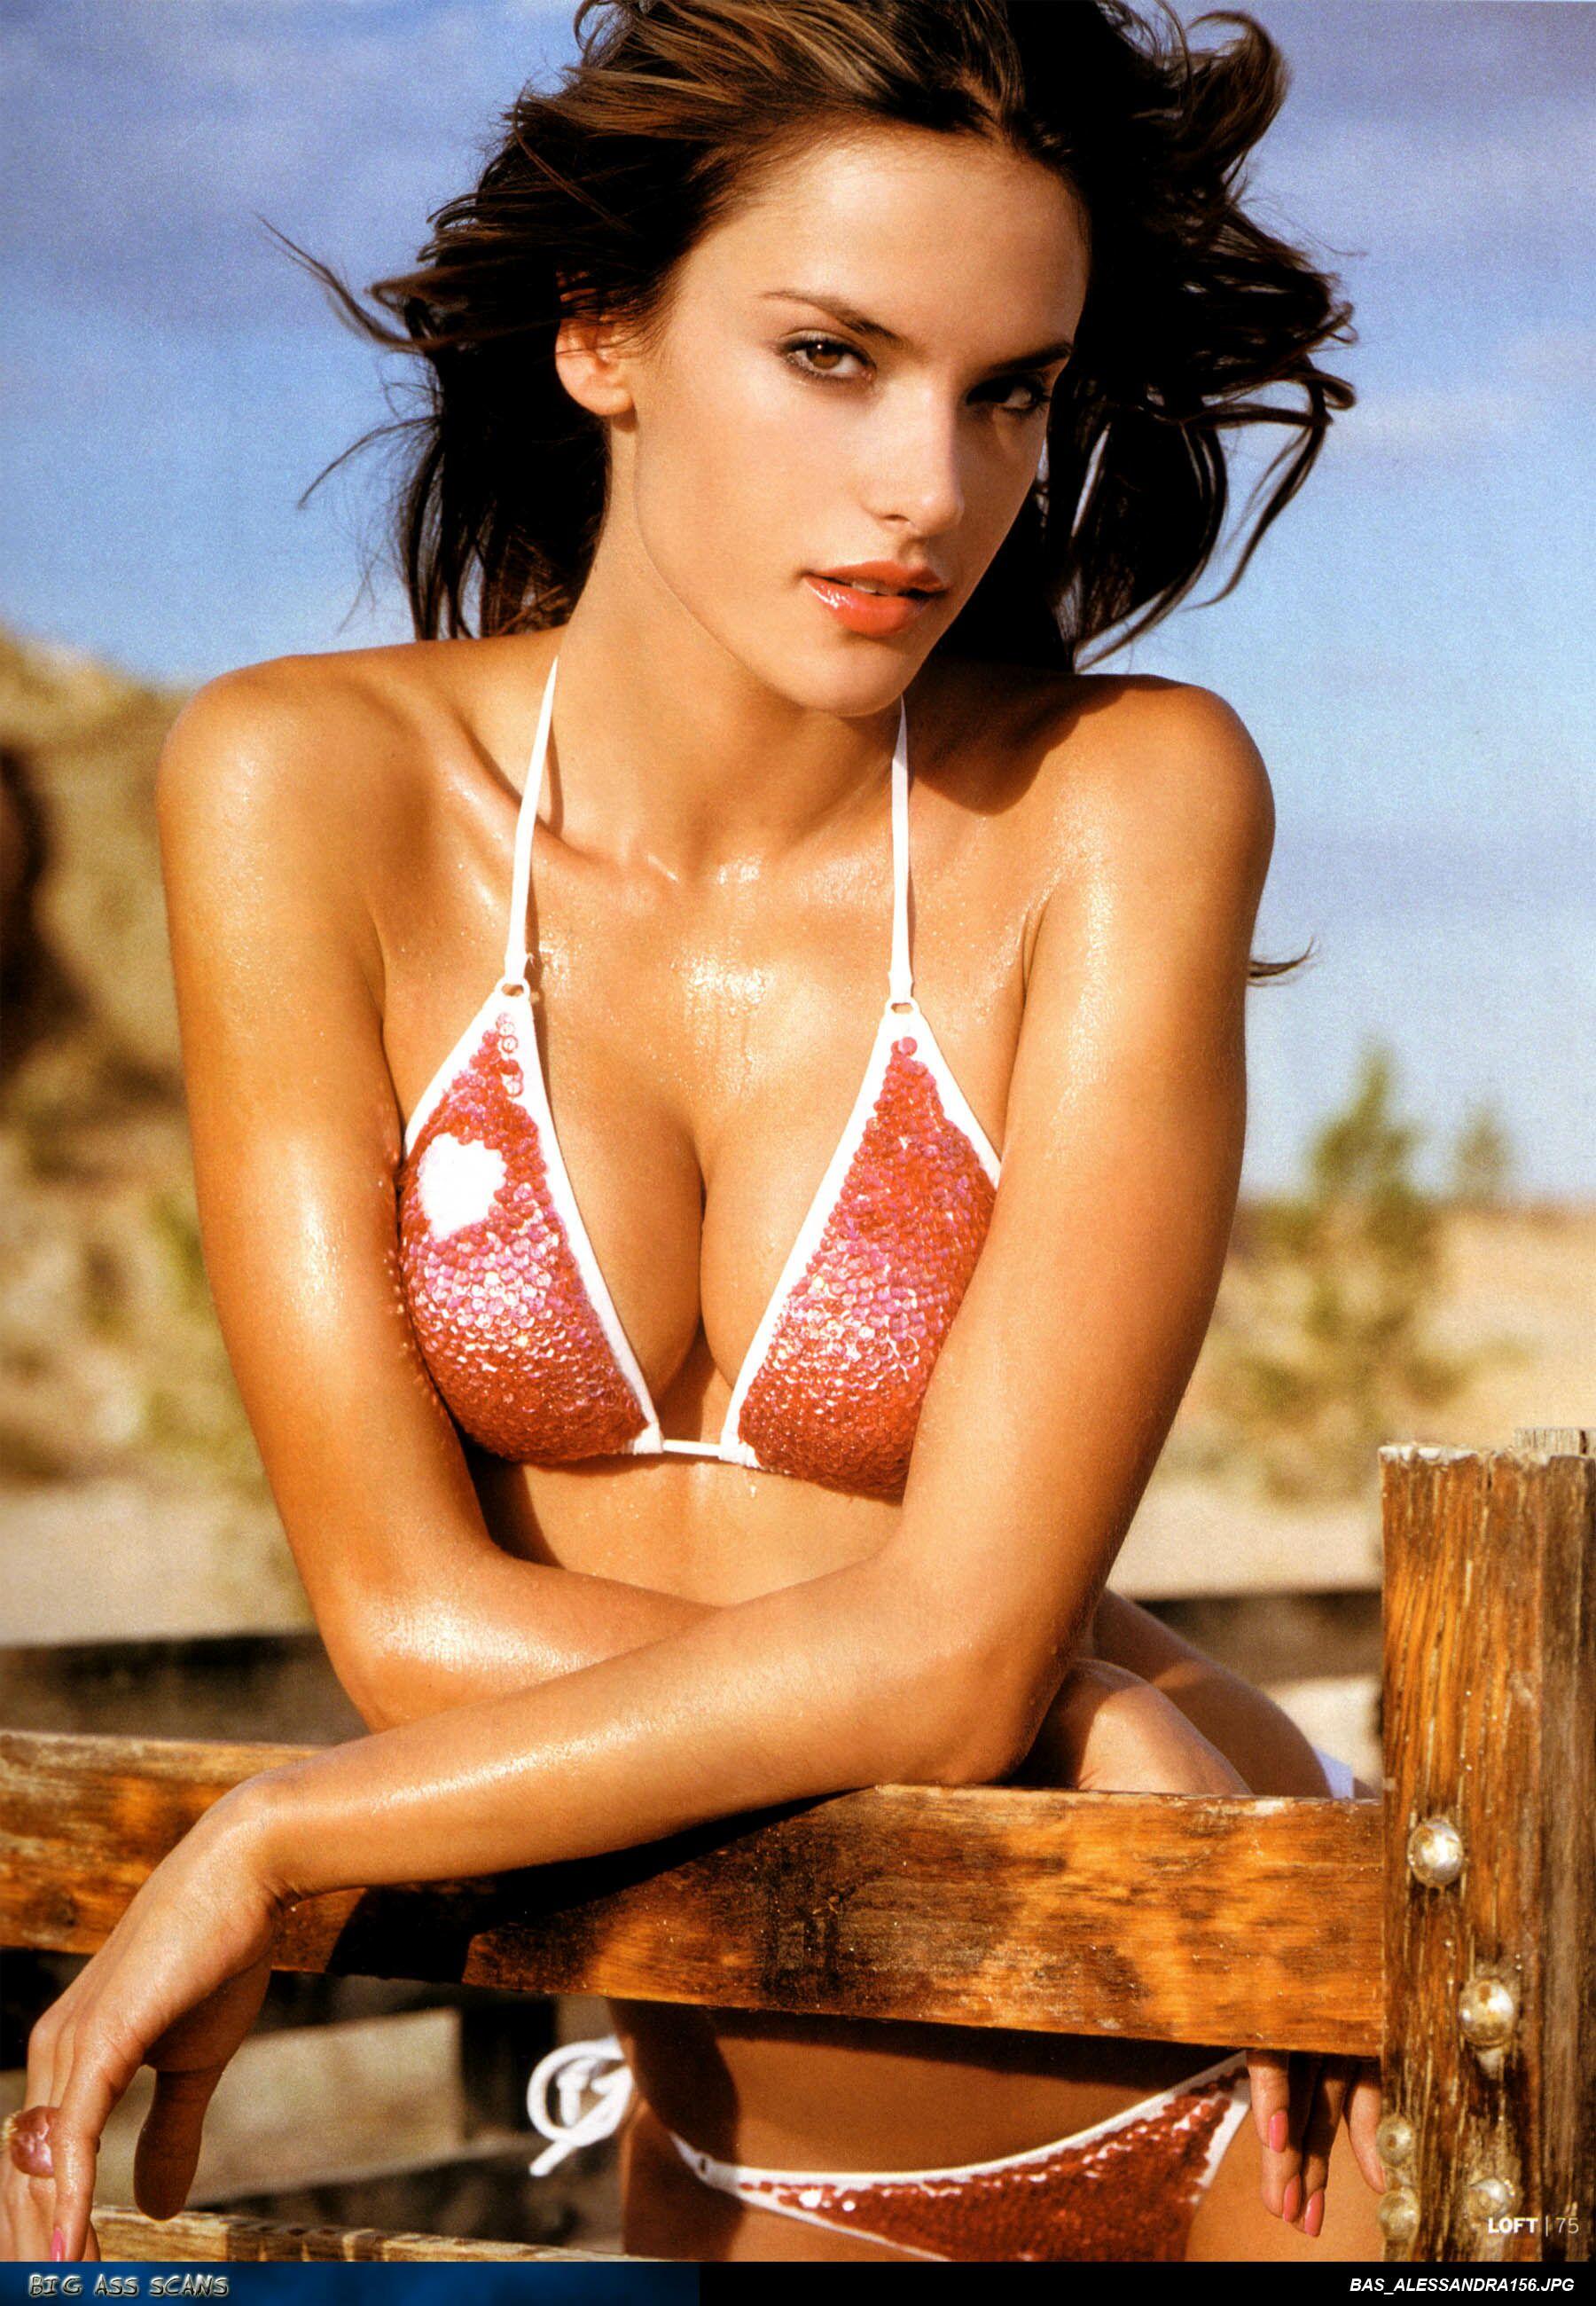 32087_Alessandra_Ambrosio_Loft_Magazine_11-2004_08_122_222lo.jpg